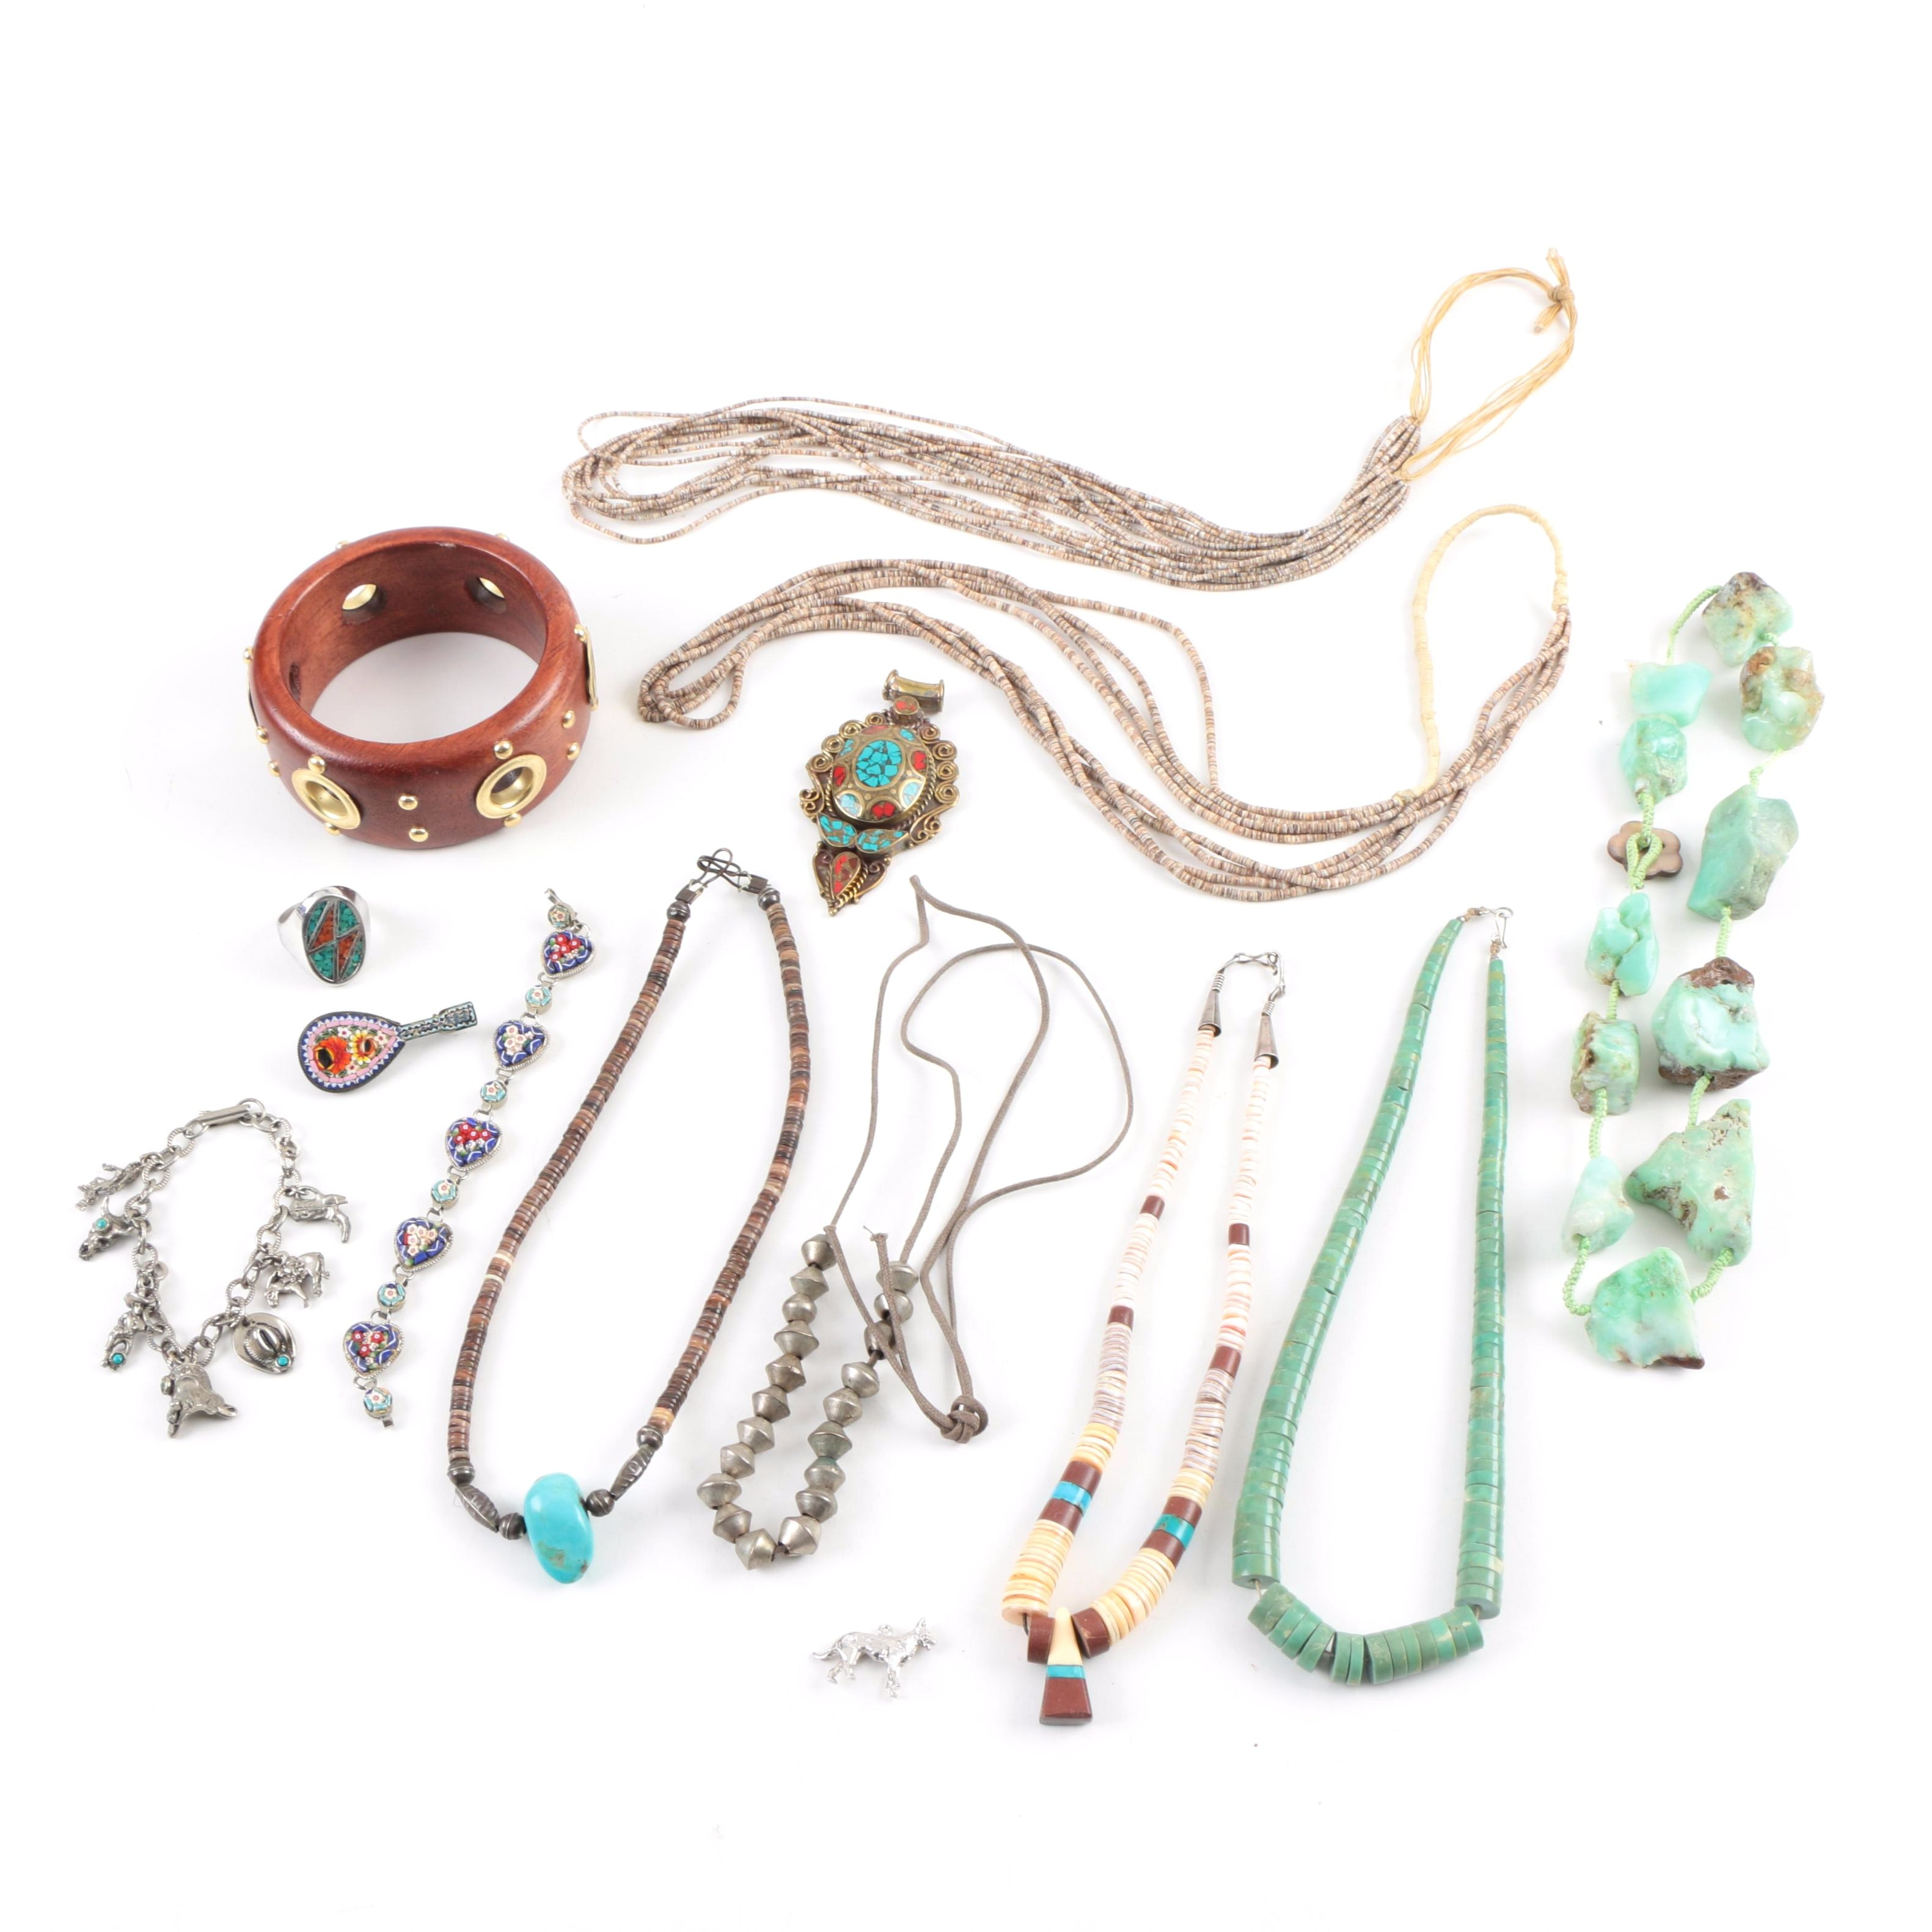 Assorted Jewelry Including an Italian Micro Mosaic Bracelet